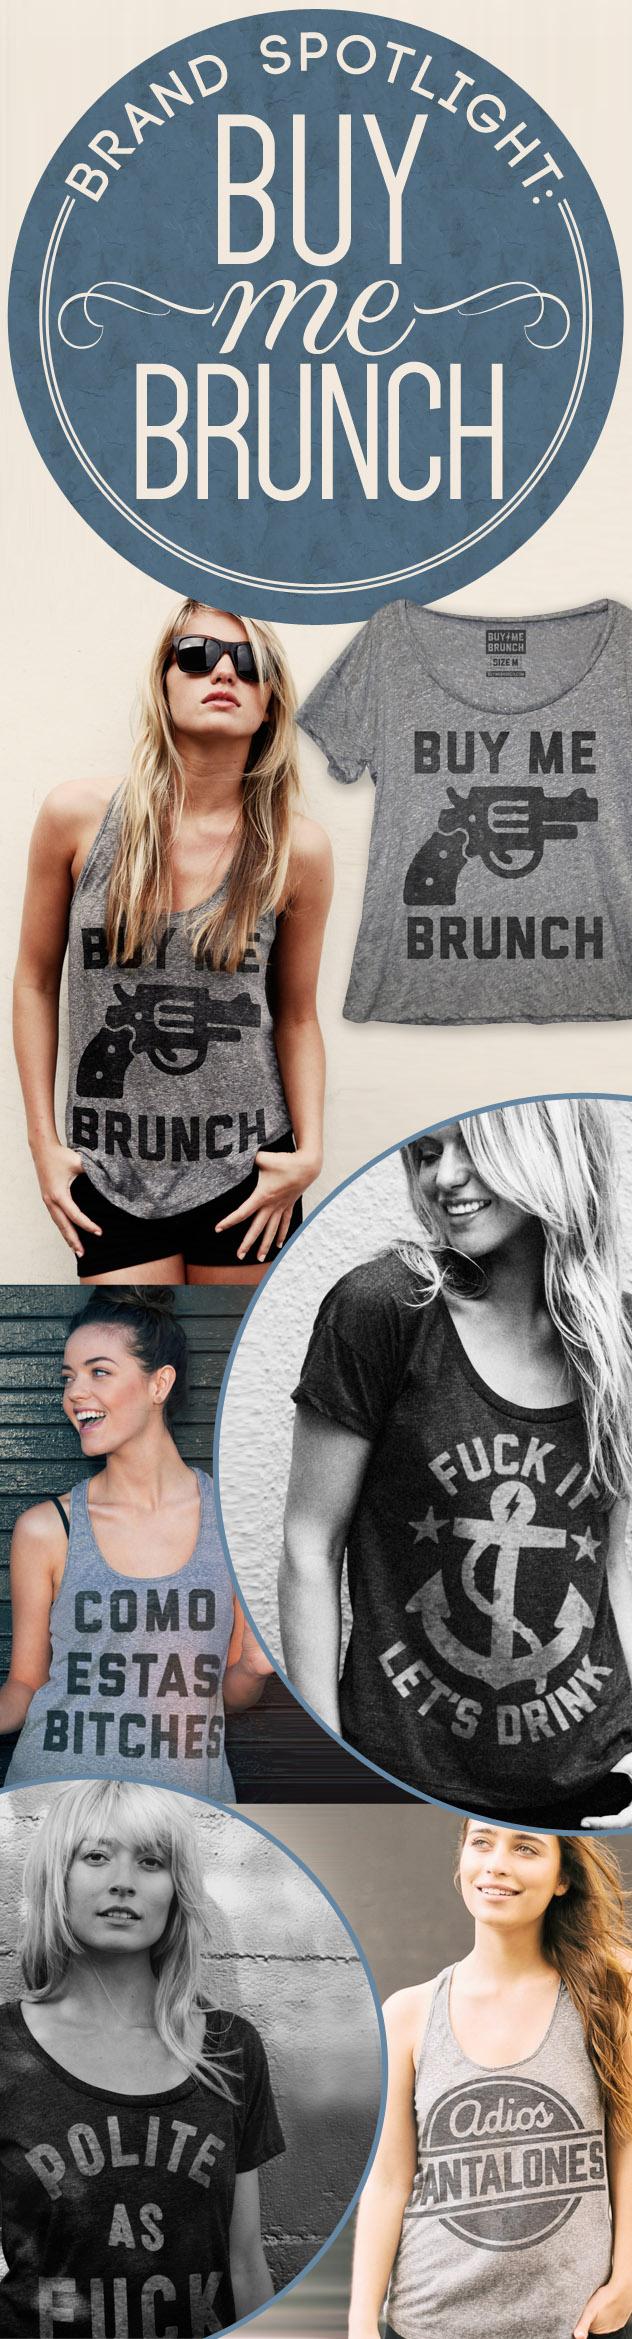 9_22blogpost_BuyMeBrunch2